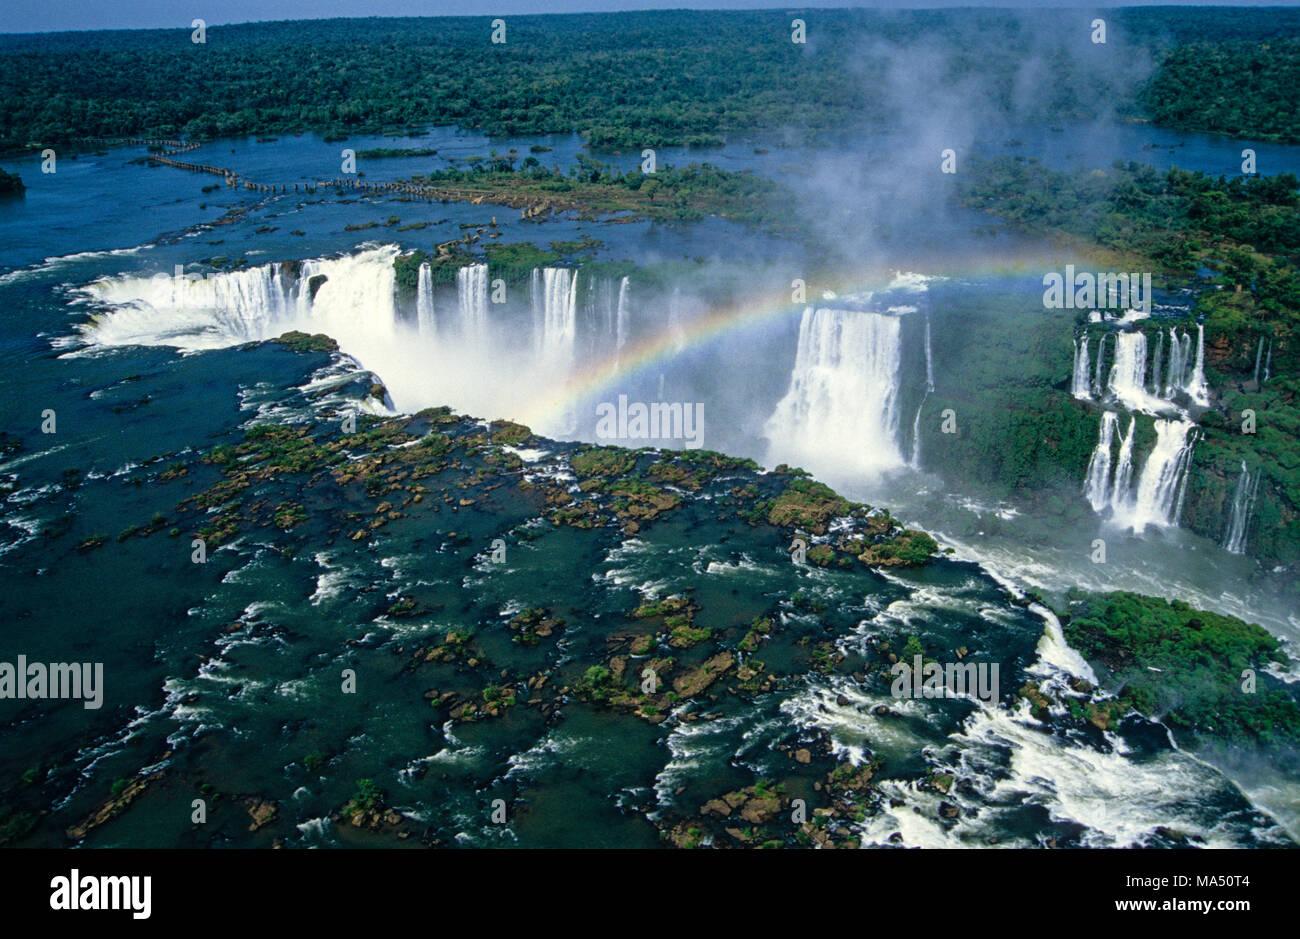 Die Iguazu Wasserfälle, Paraná, Brasilien, Südamerika Stockfoto